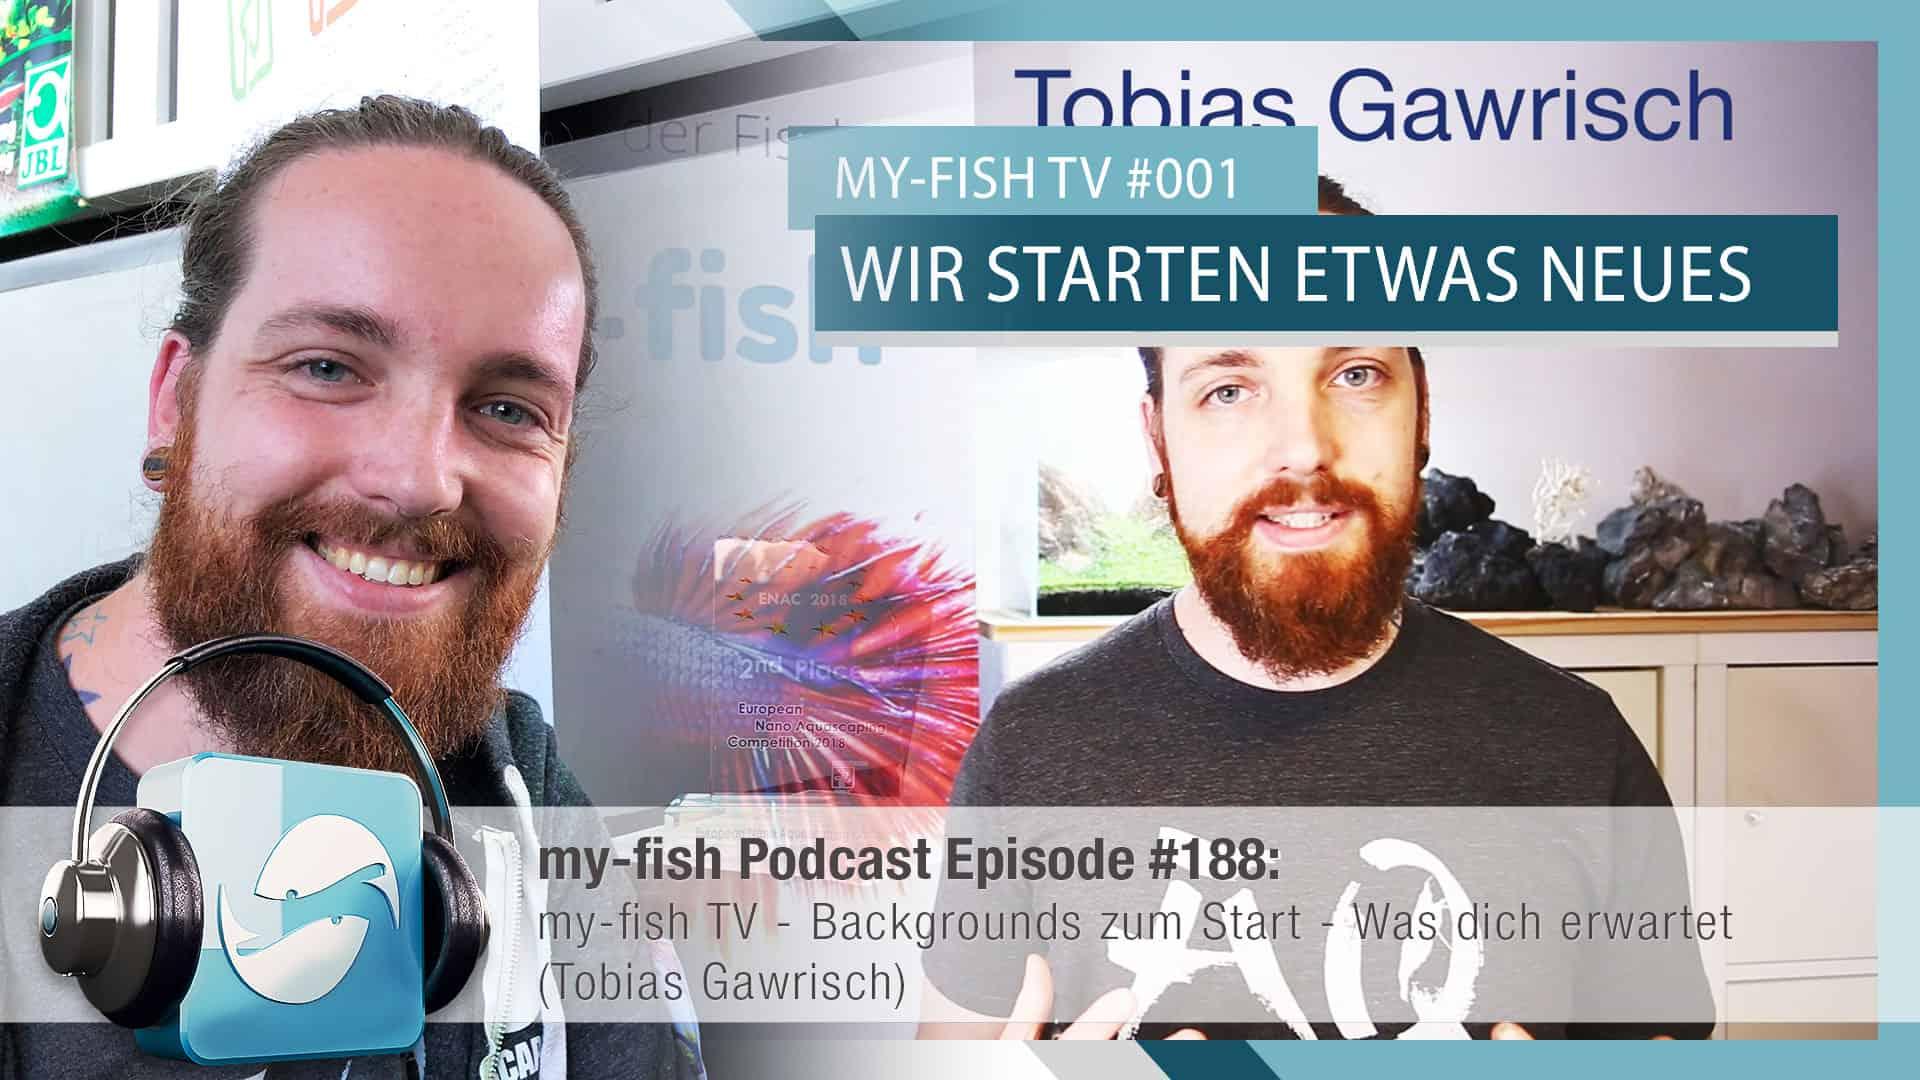 188 my-fish TV - Backgrounds zum Start (Tobias Gawrisch) 1